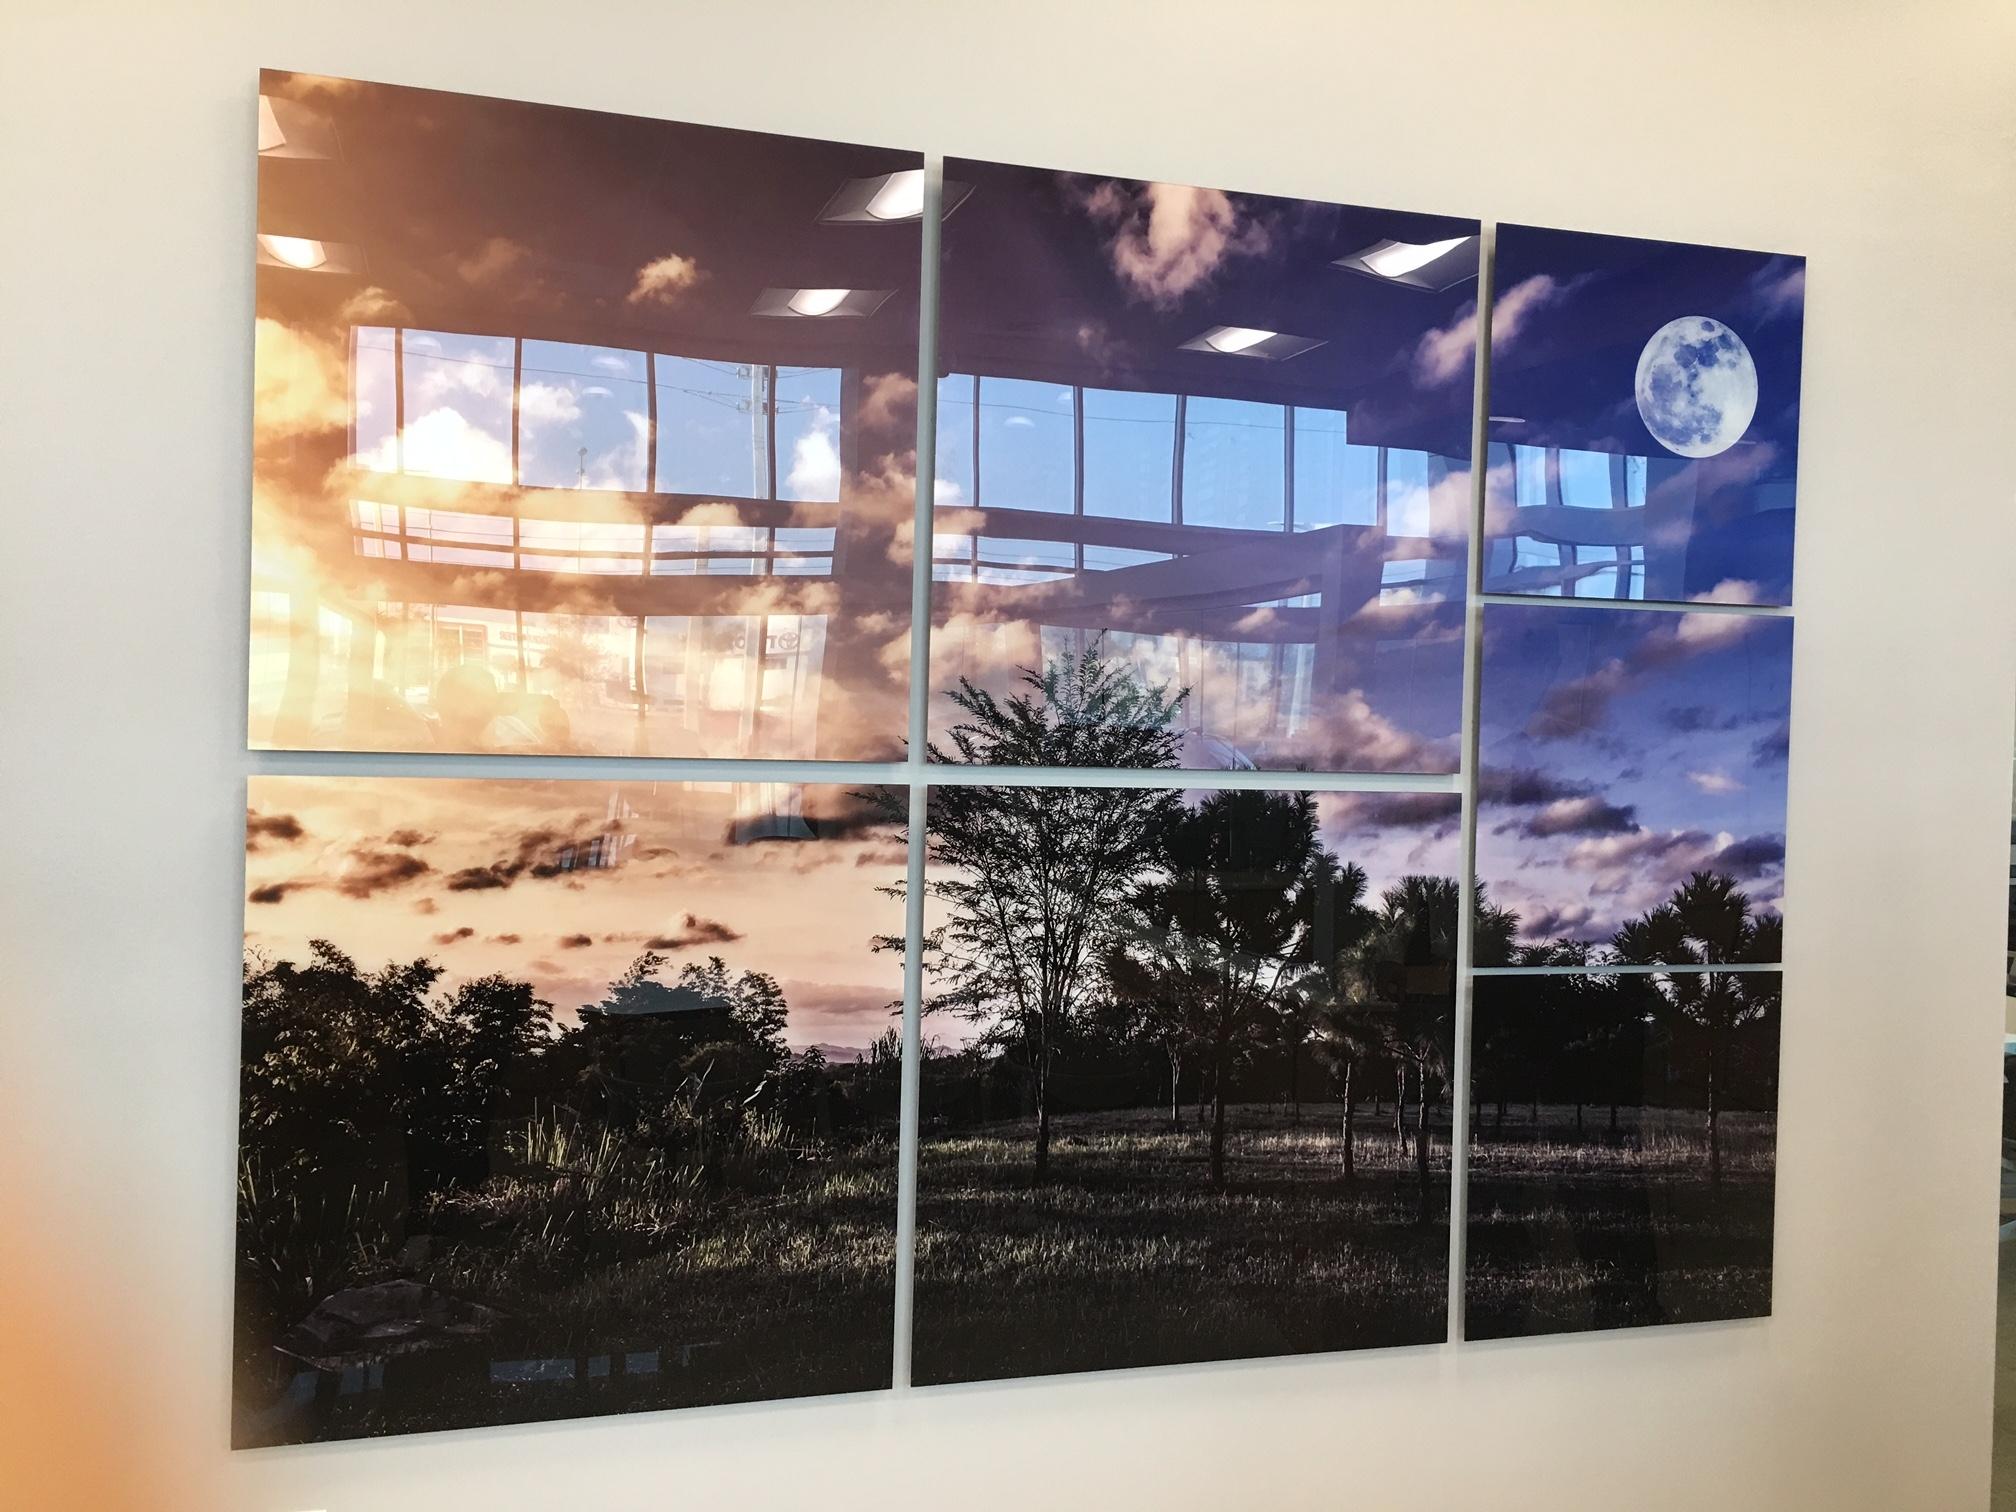 Acrylic Wall Art   Glass Photo Prints   Custom Acrylic Prints   Big Pertaining To Most Recent Acrylic Wall Art (View 2 of 20)